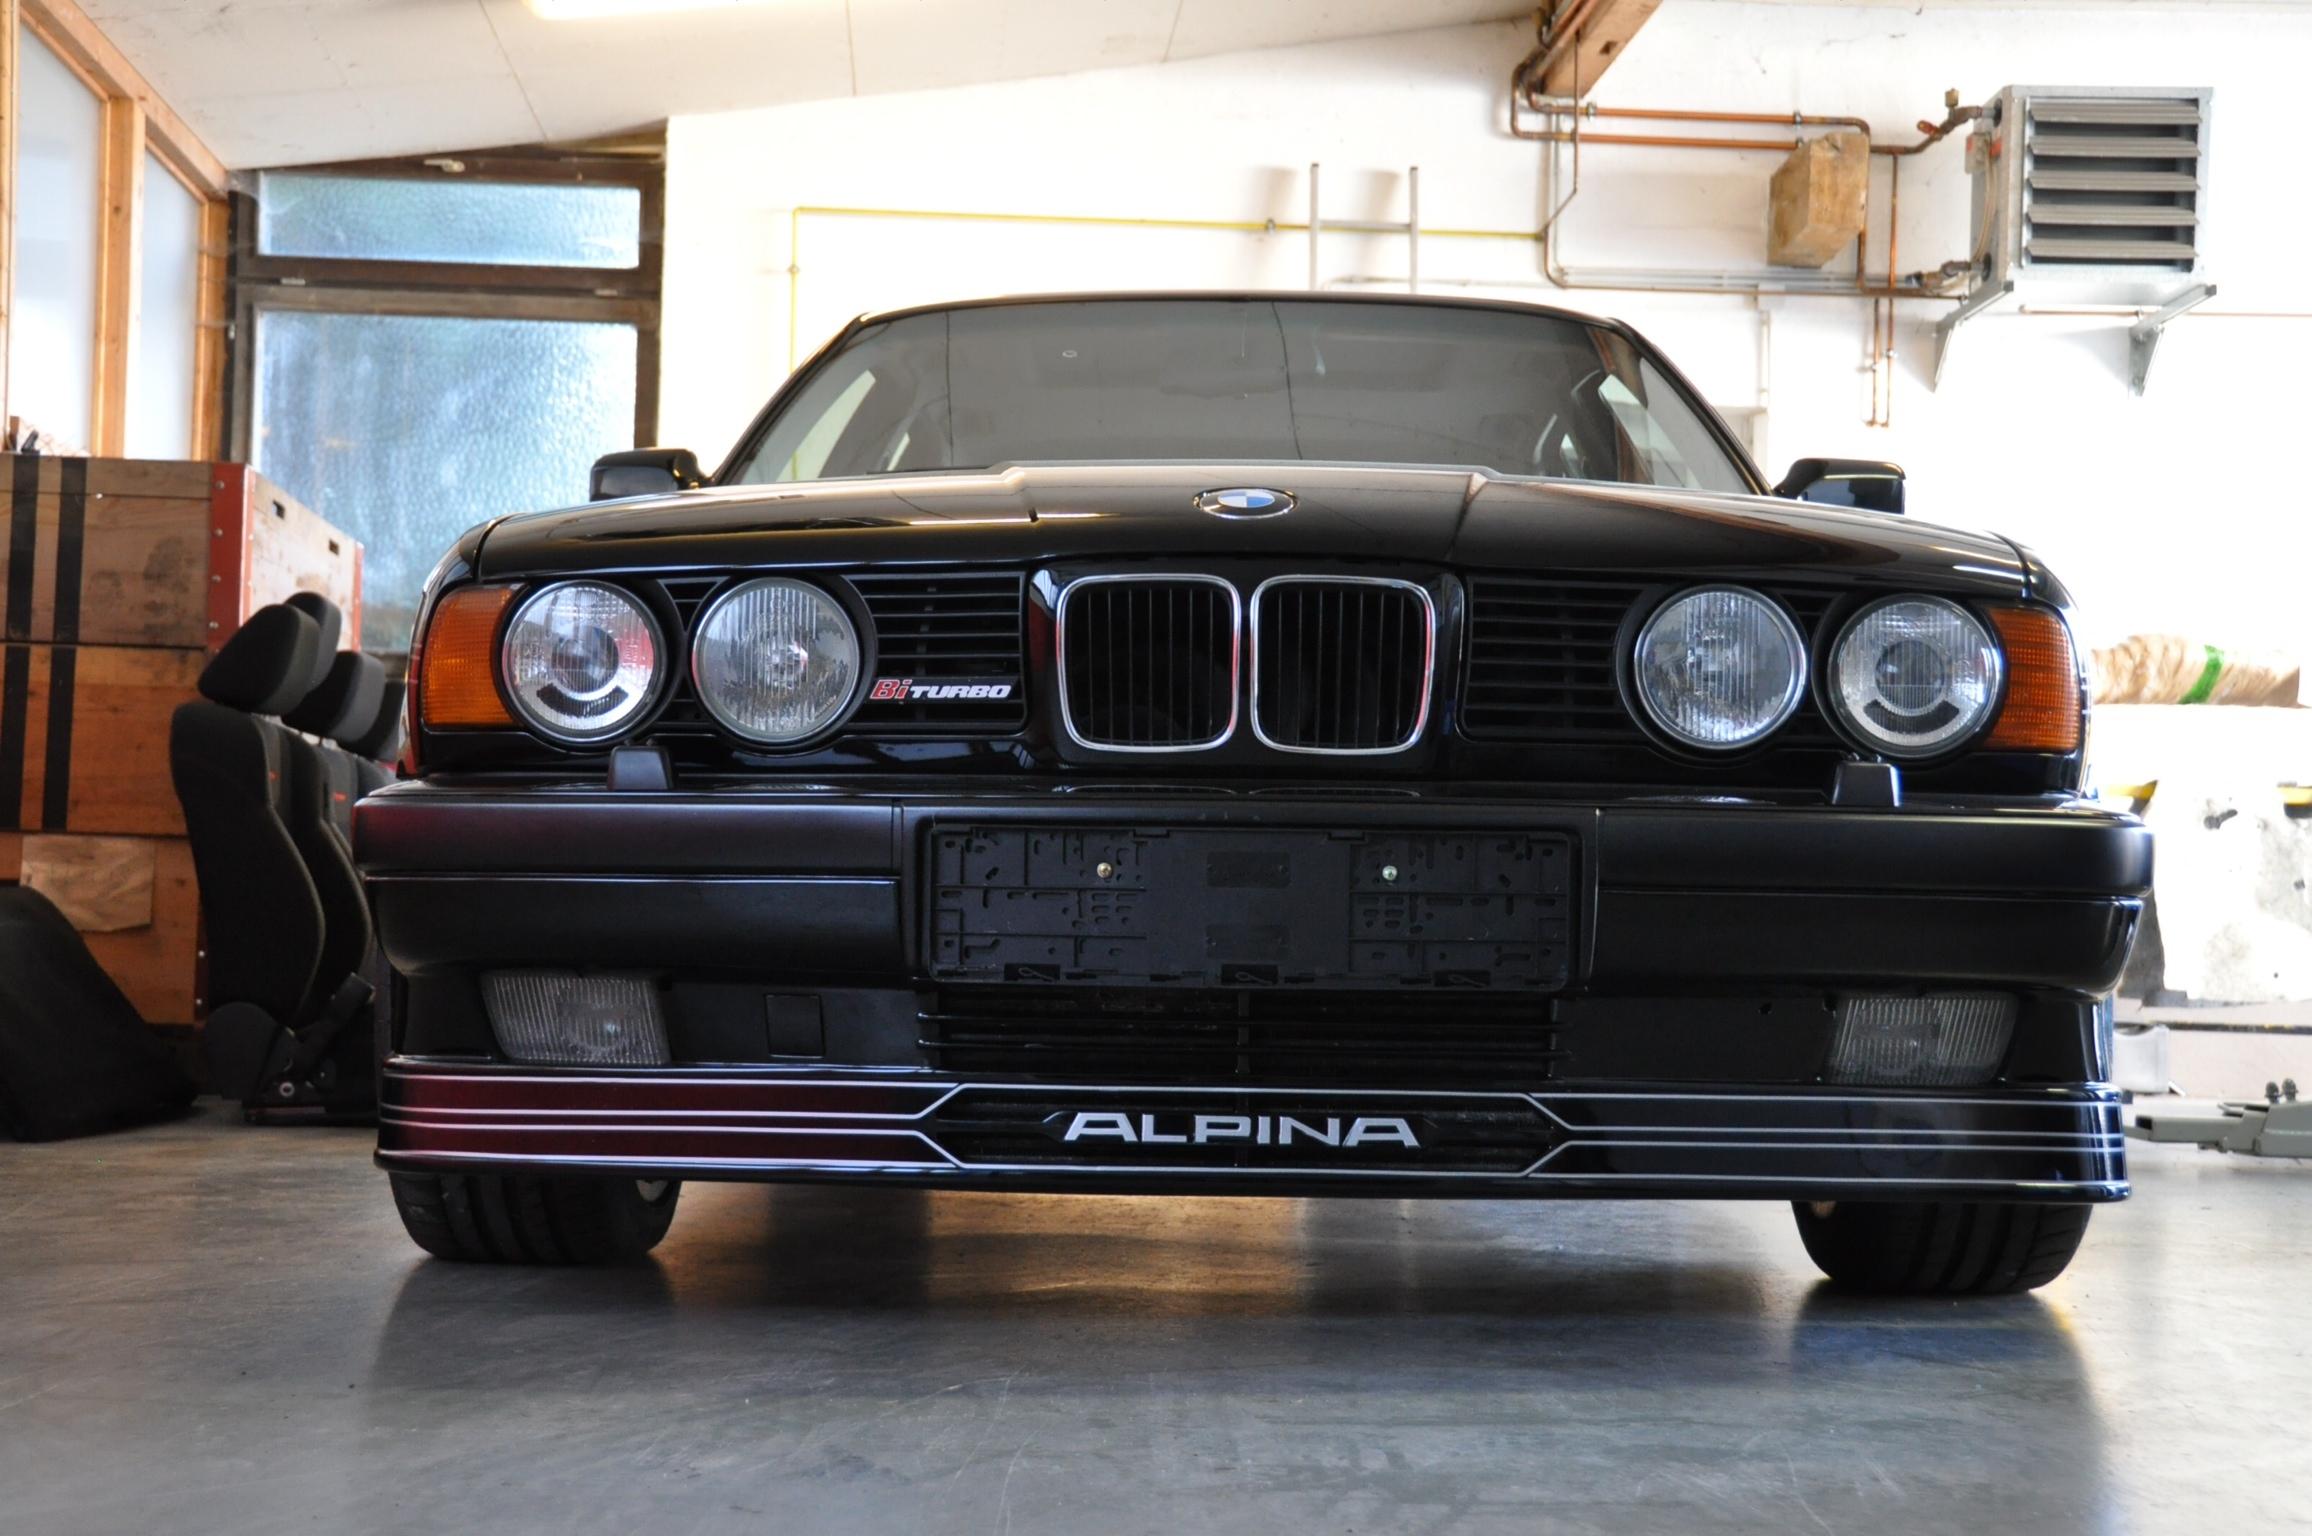 1990 Alpina B10 Bi-turbo: Brilliant Bargains on eBay Germany ...